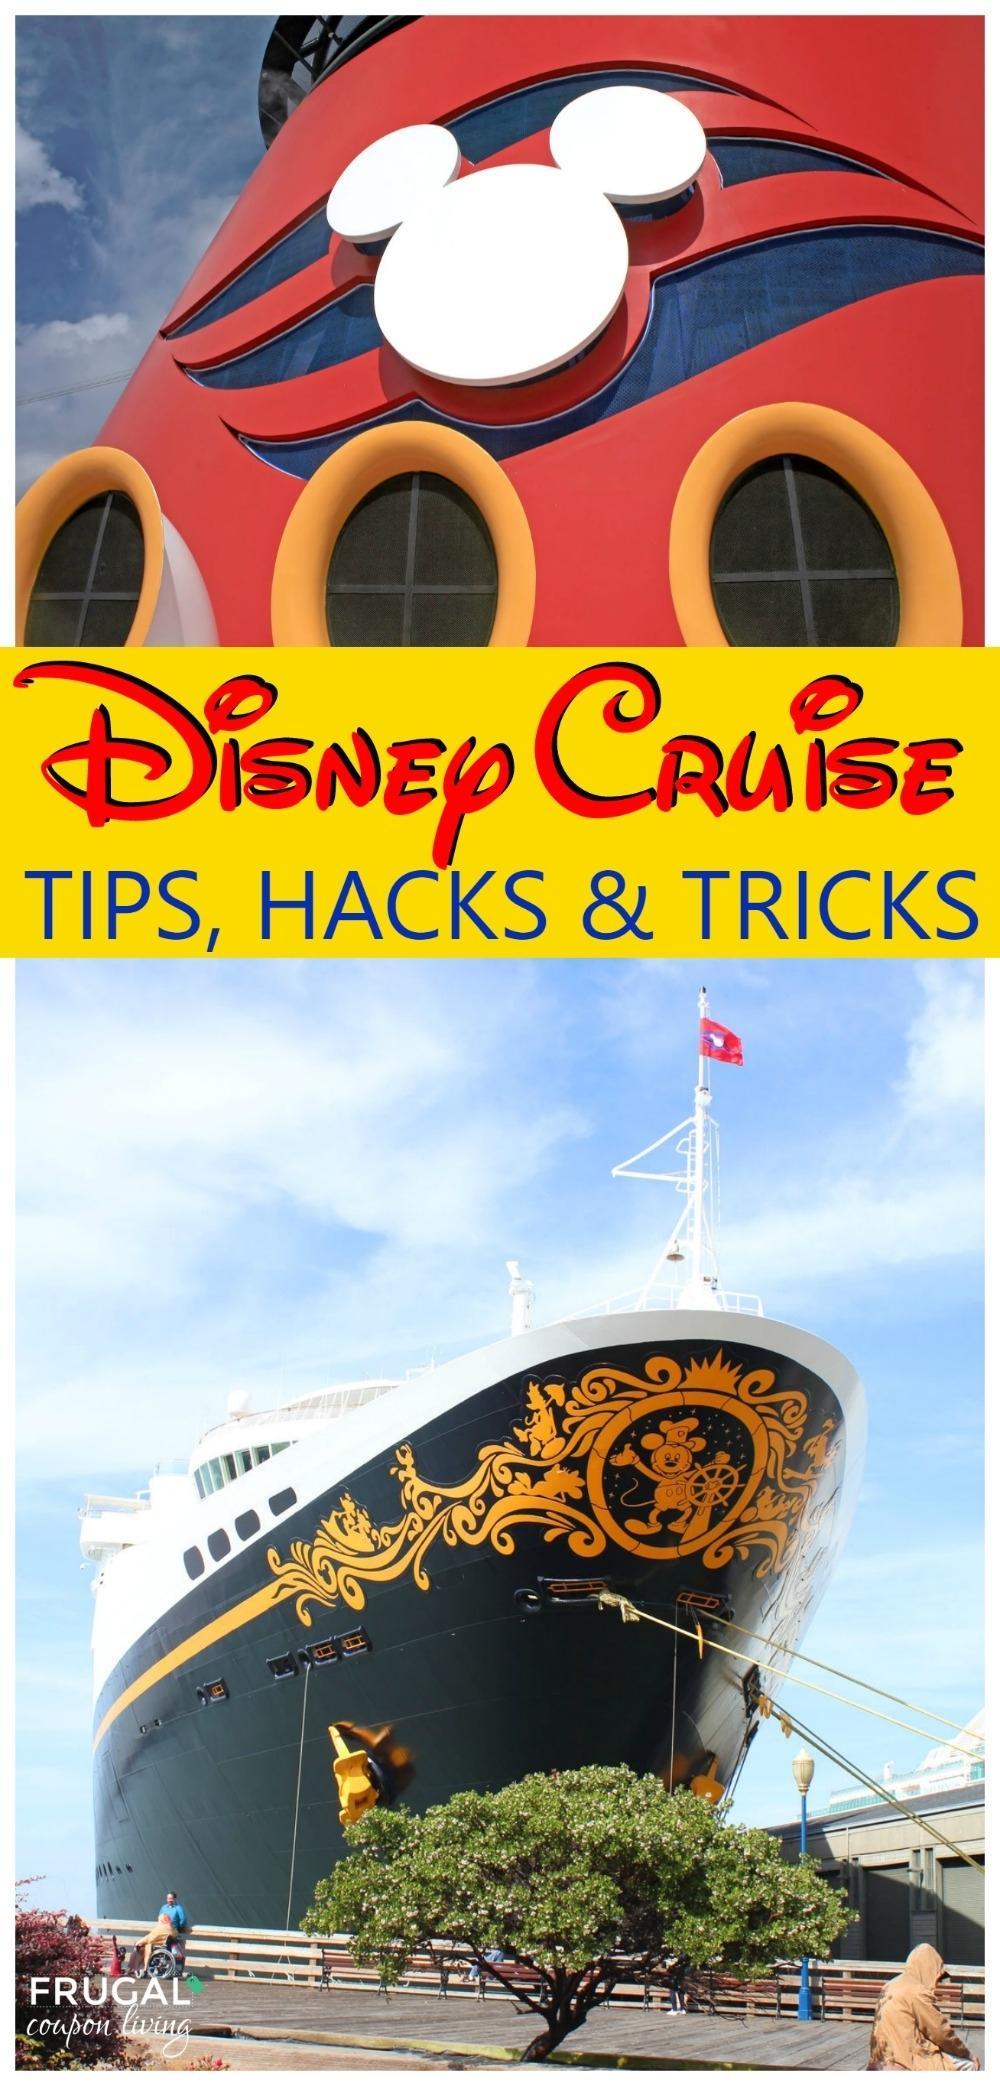 Disney Cruise Tips, Hacks, And Tricks regarding Disney Cruise Countdown Calendar Printable